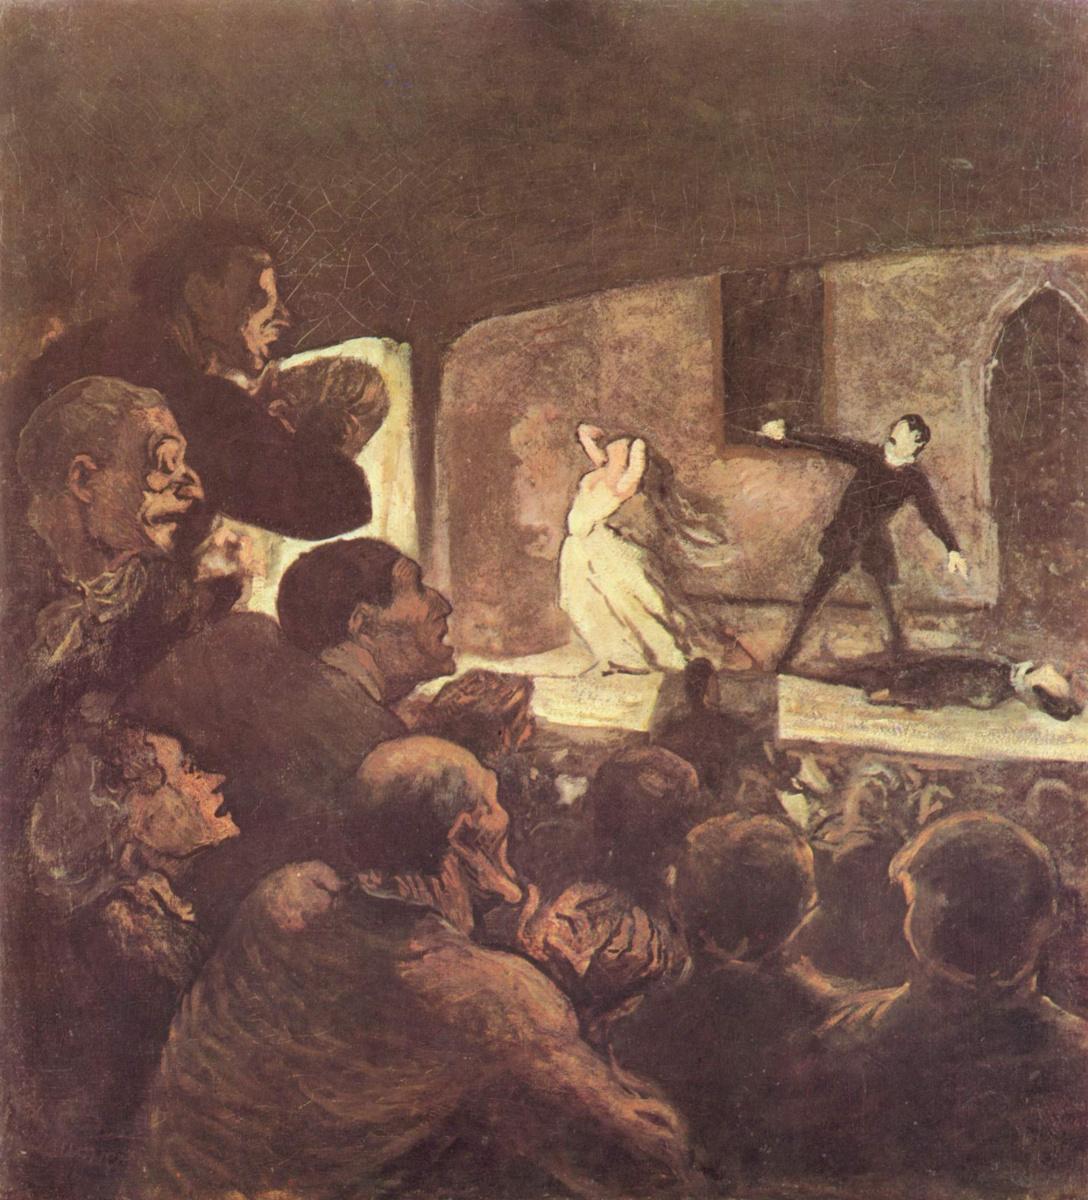 Honore Daumier. Romance